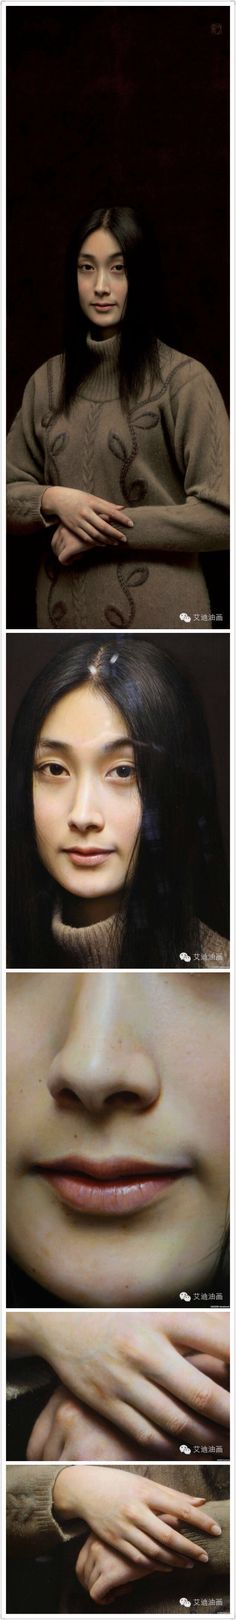 By Leng jun 冷军